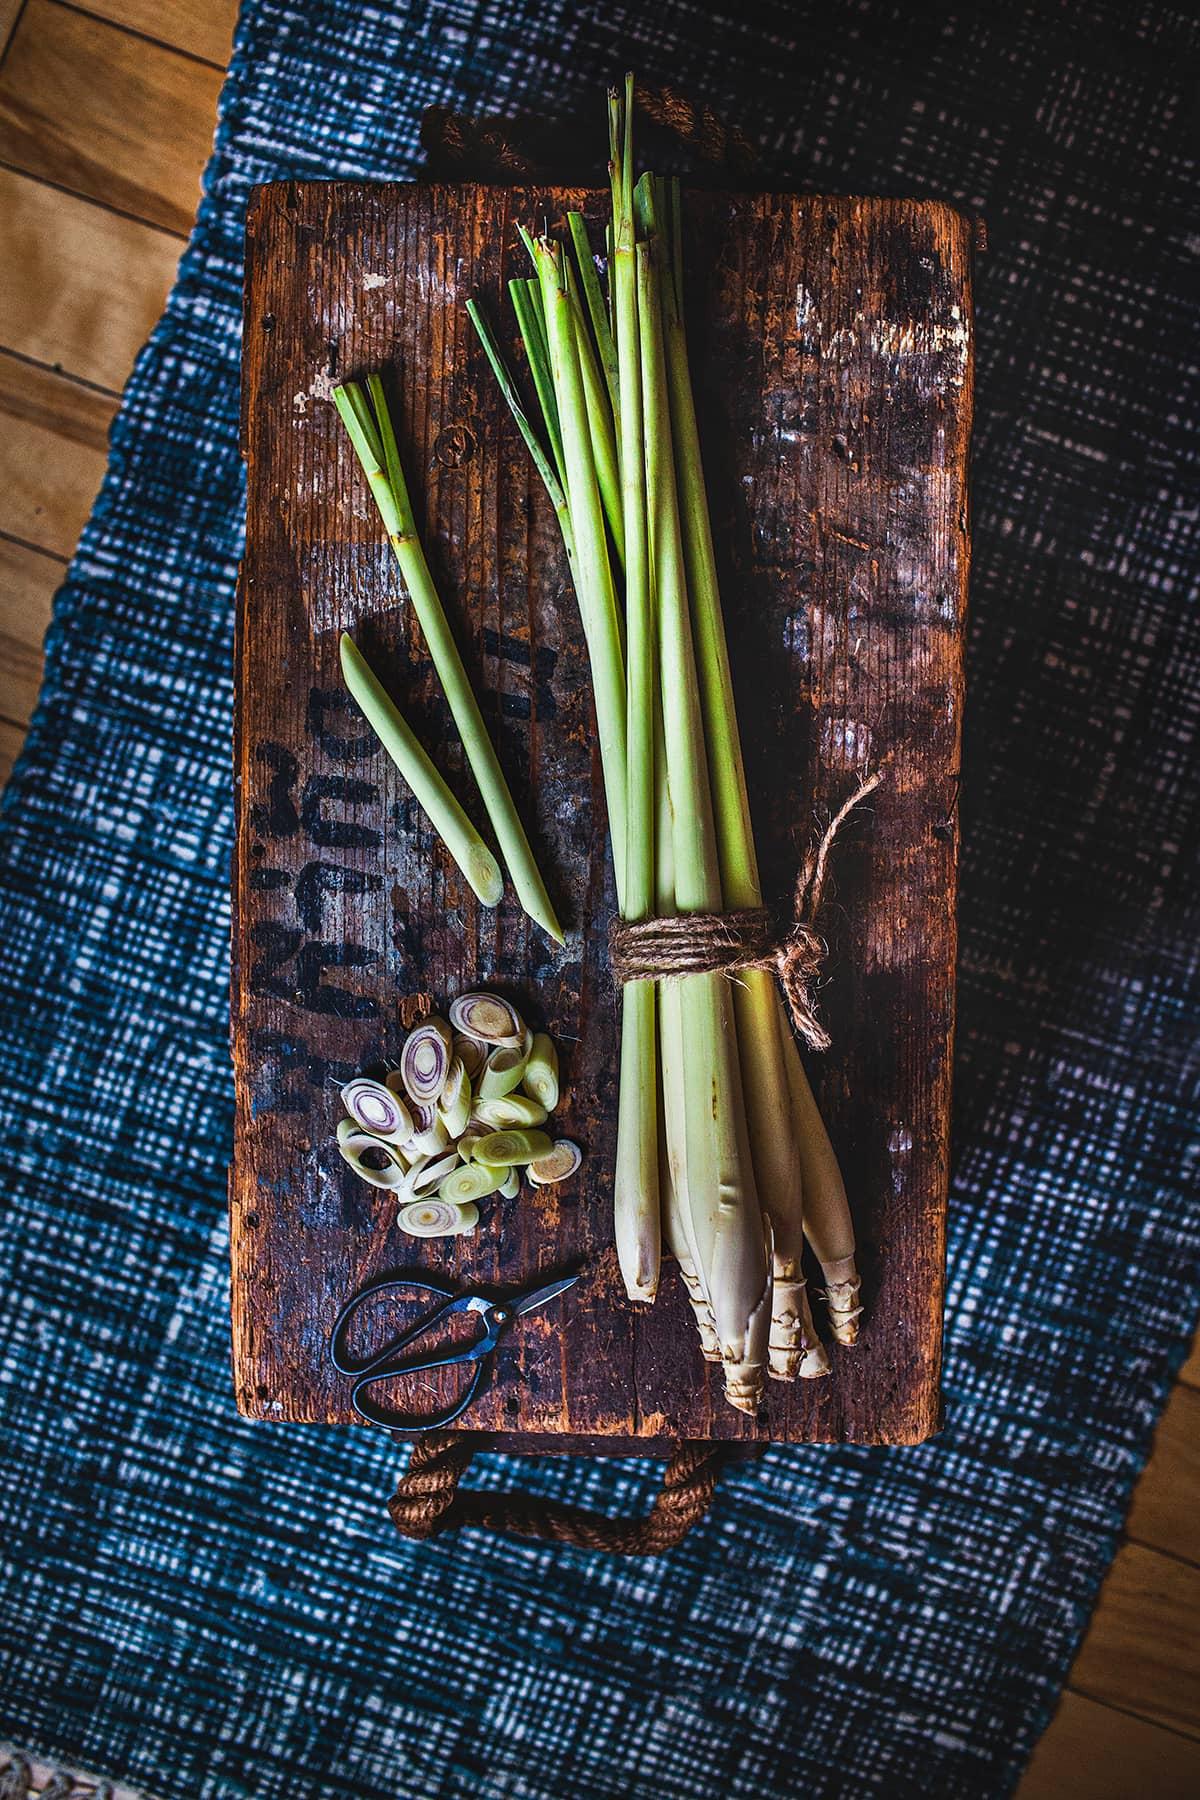 Lemongrass, one of the main herbs used in countless recipes in the Thai cuisine. #lemongrass #tthaifood #thaiherbs #lemongrassrecipes